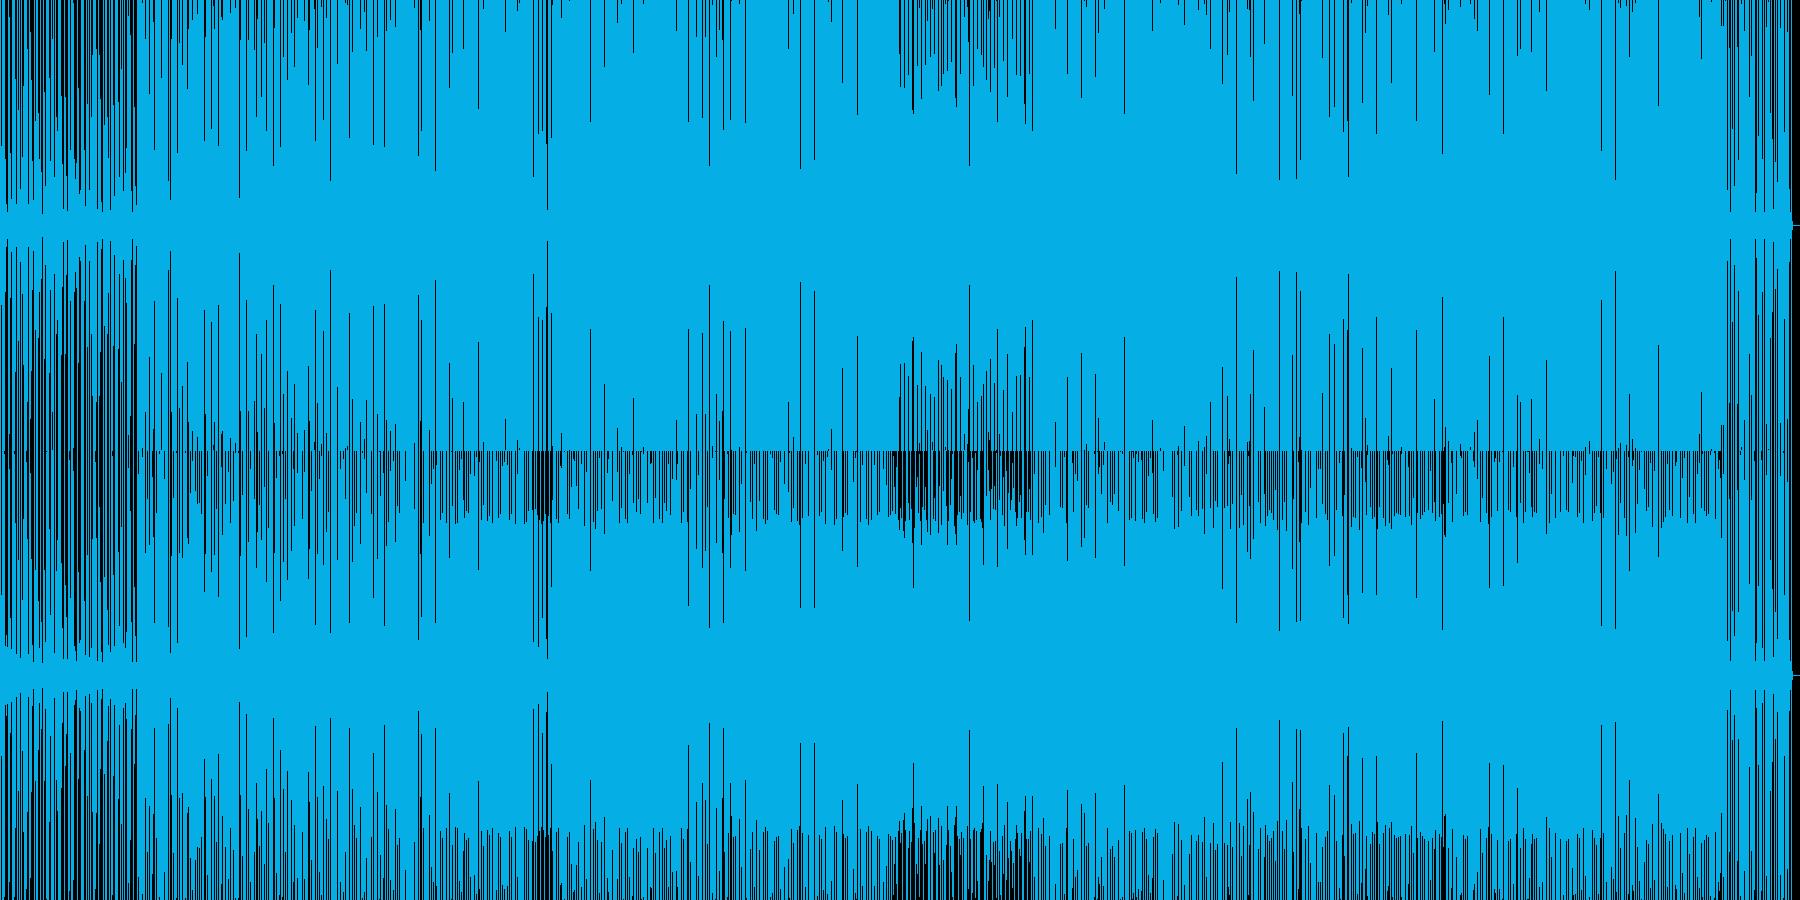 minimal house 26 の再生済みの波形